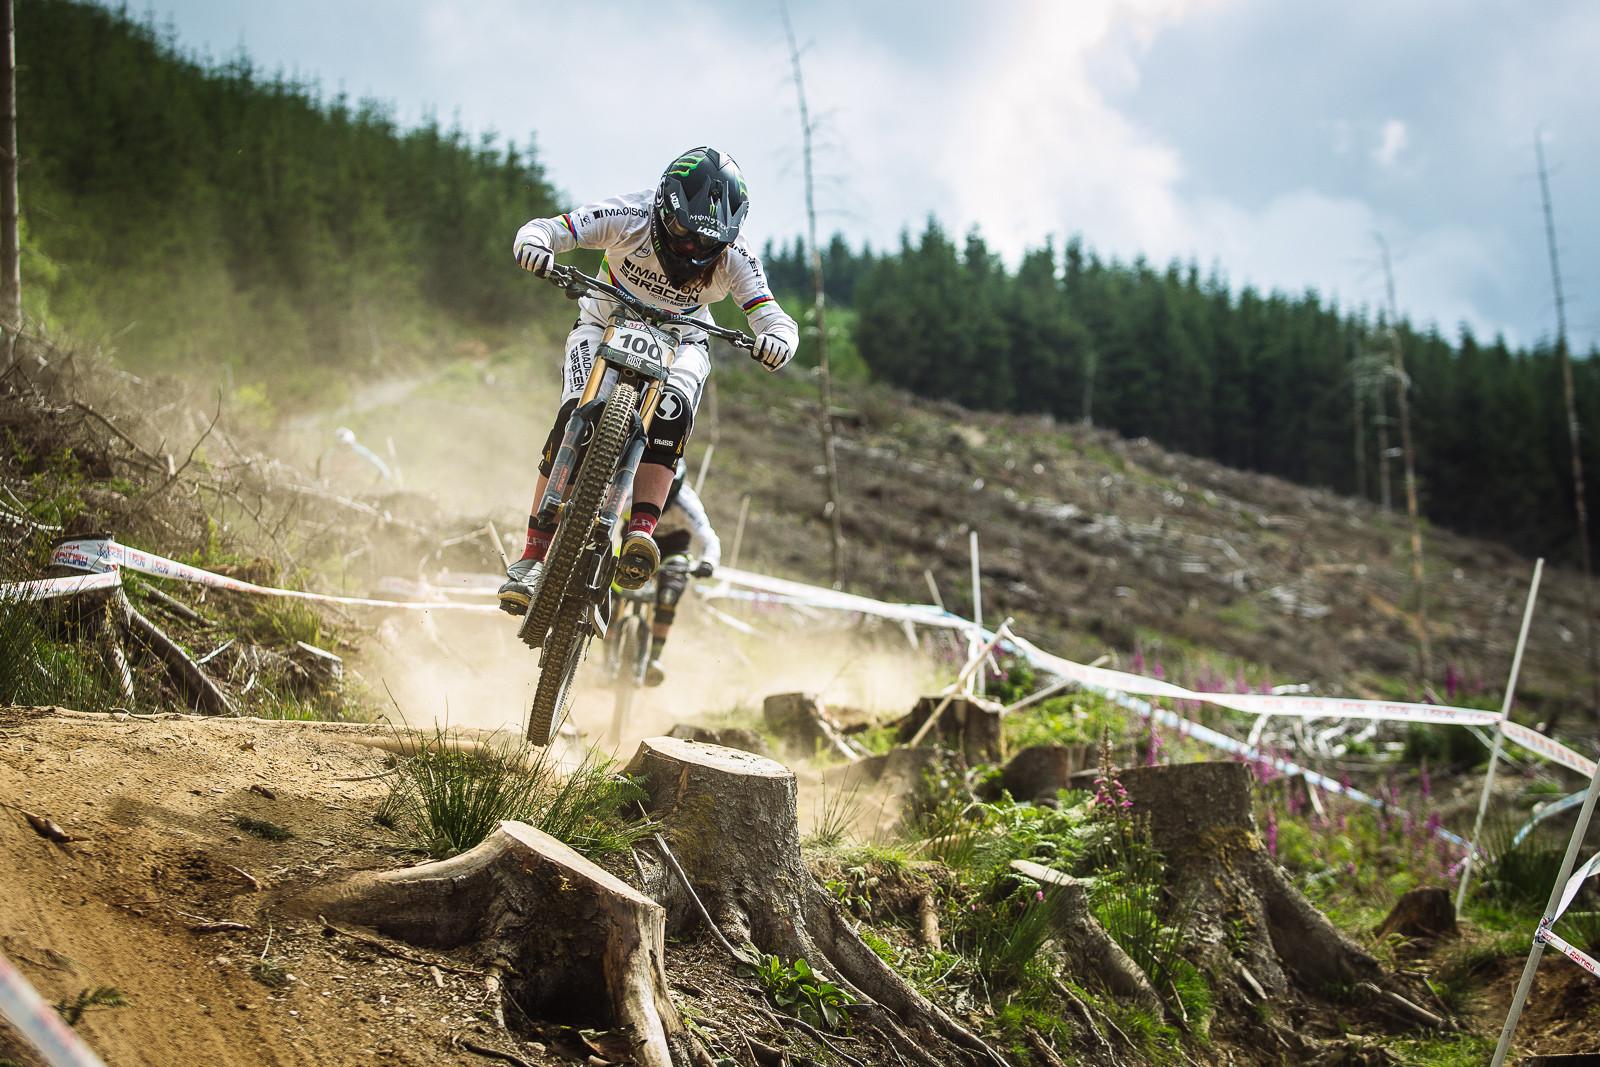 Manon Carpenter,  British DH Series, Bala - RACE REPORT - 2015 British Downhill Series Bala - Mountain Biking Pictures - Vital MTB